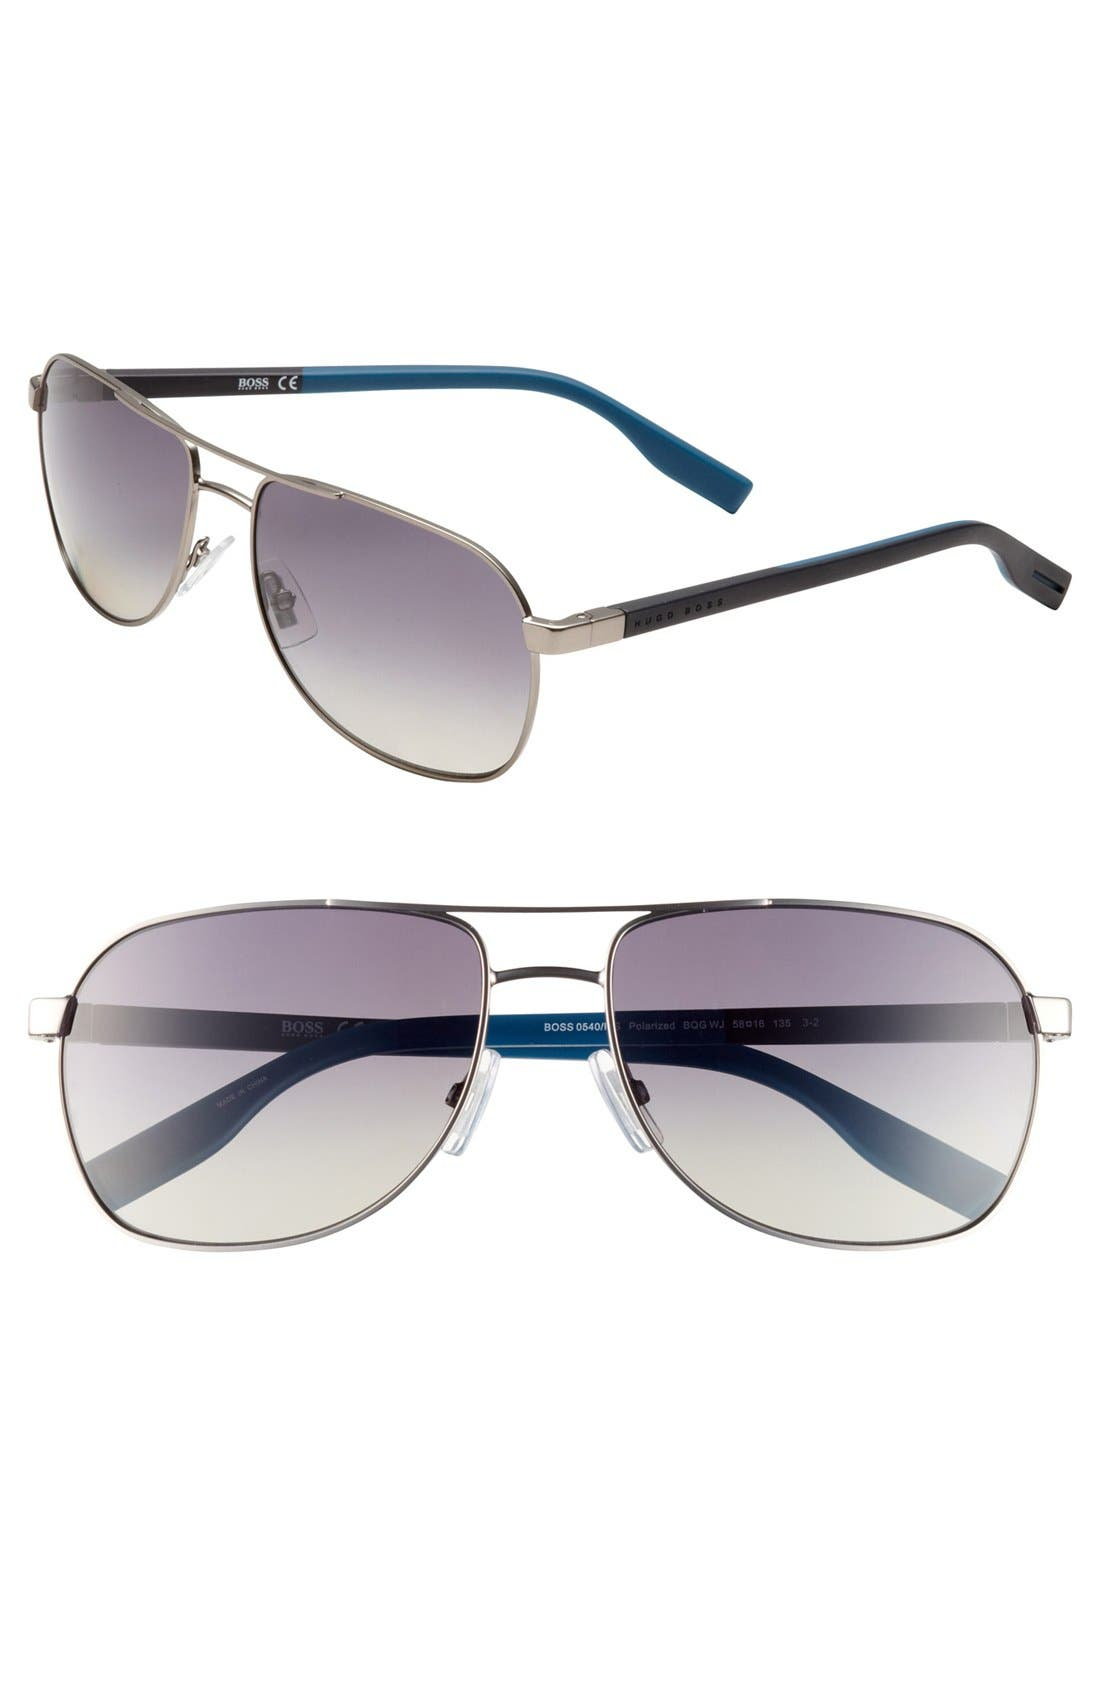 Main Image - BOSS Polarized Aviator Sunglasses